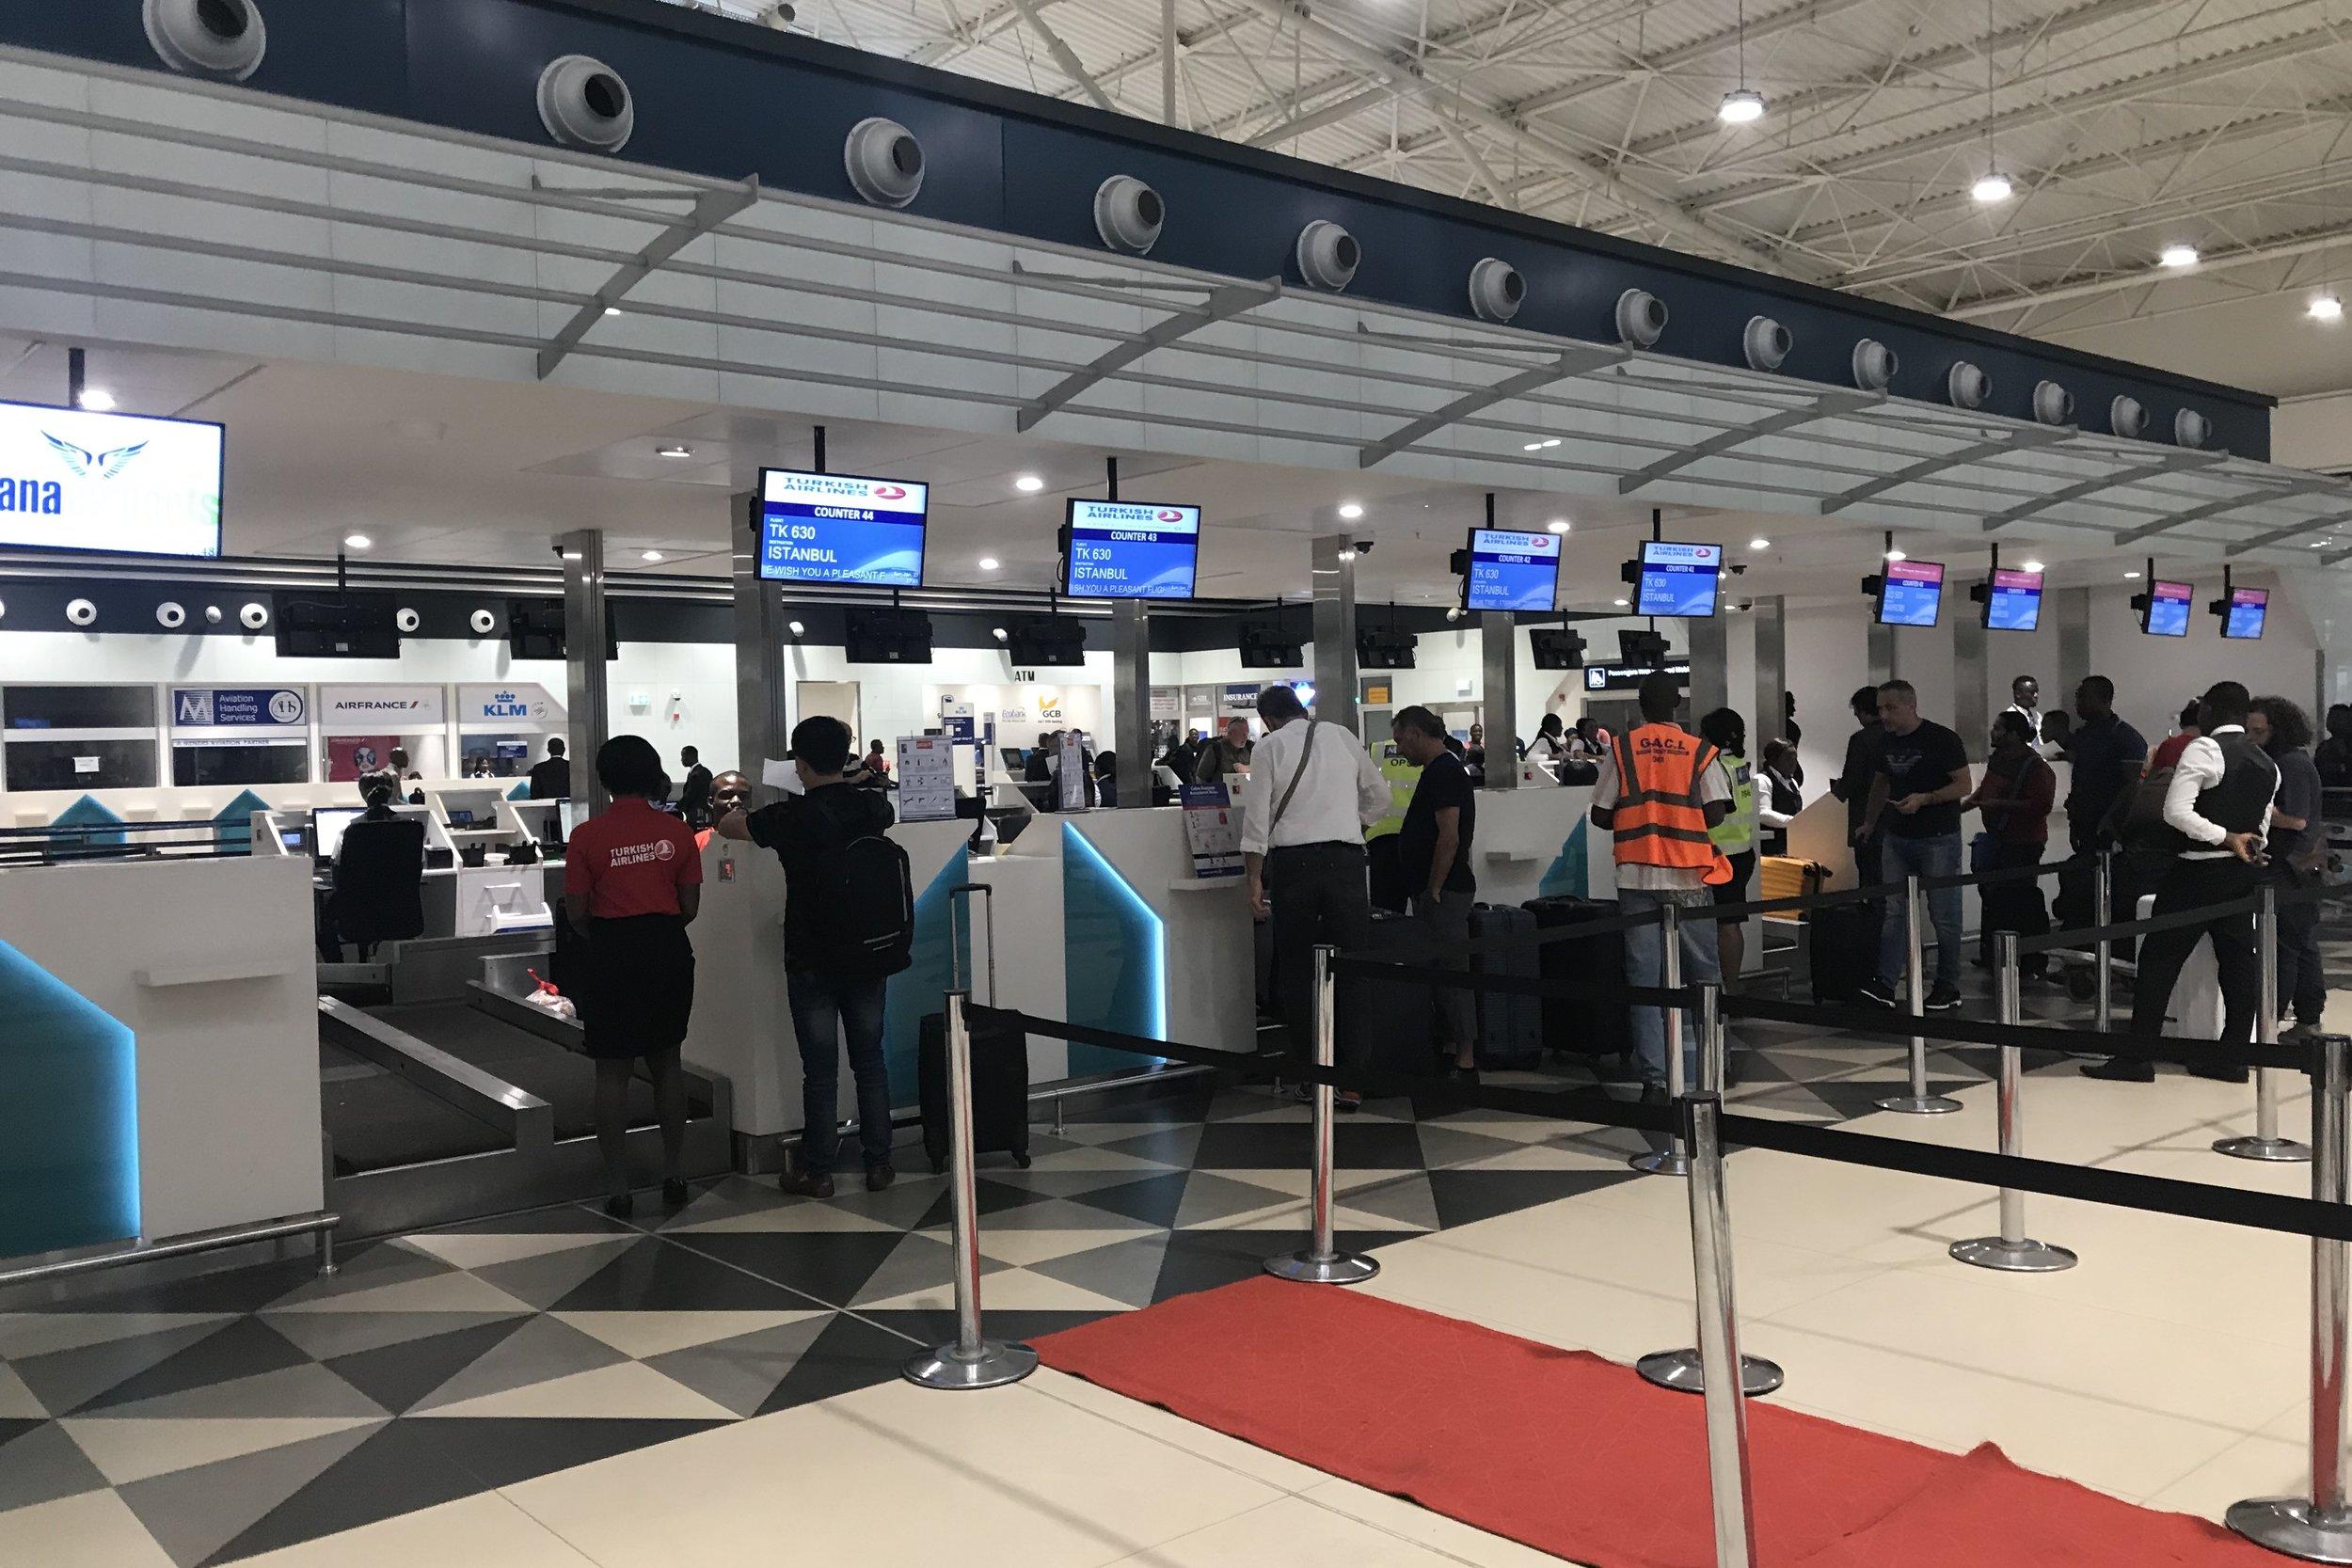 Kotoka International Airport – Turkish Airlines check-in